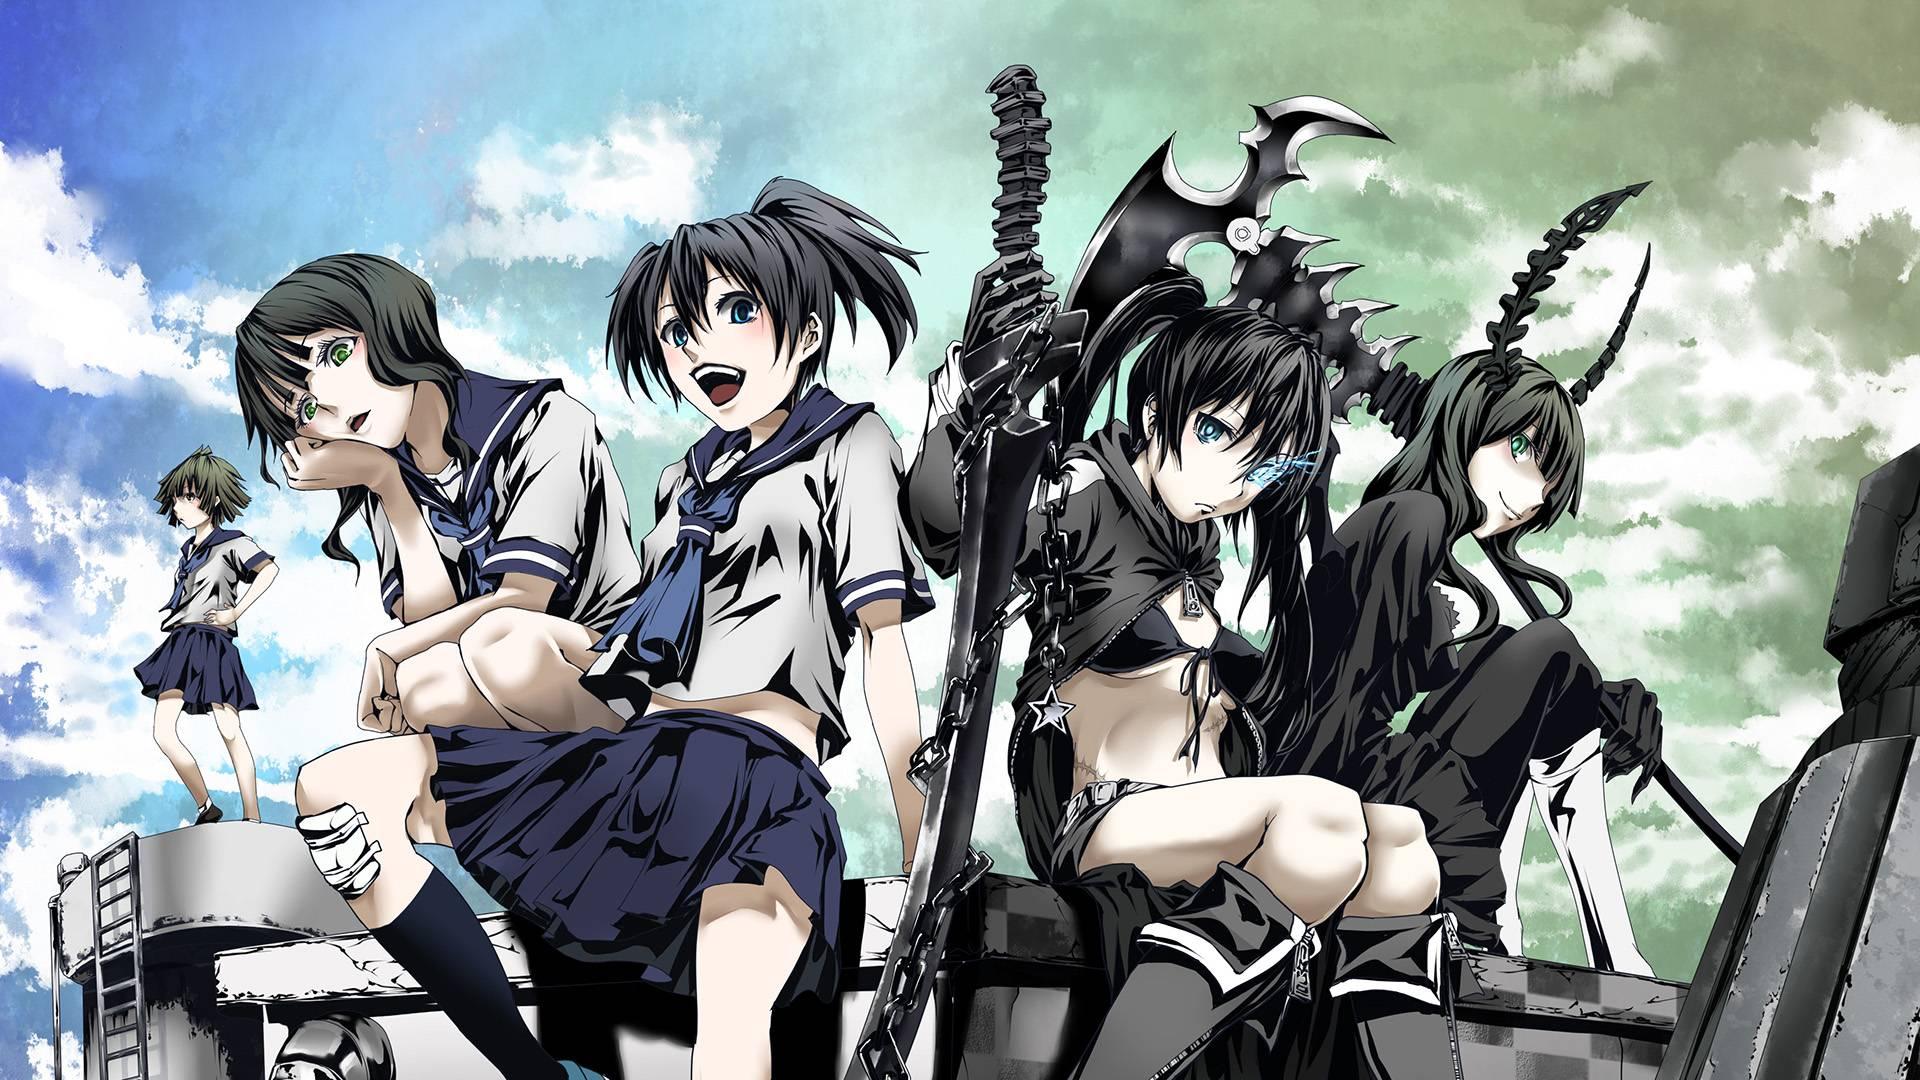 Insane Black Rock Shooter Zerochan Anime Image Board 1920x1080